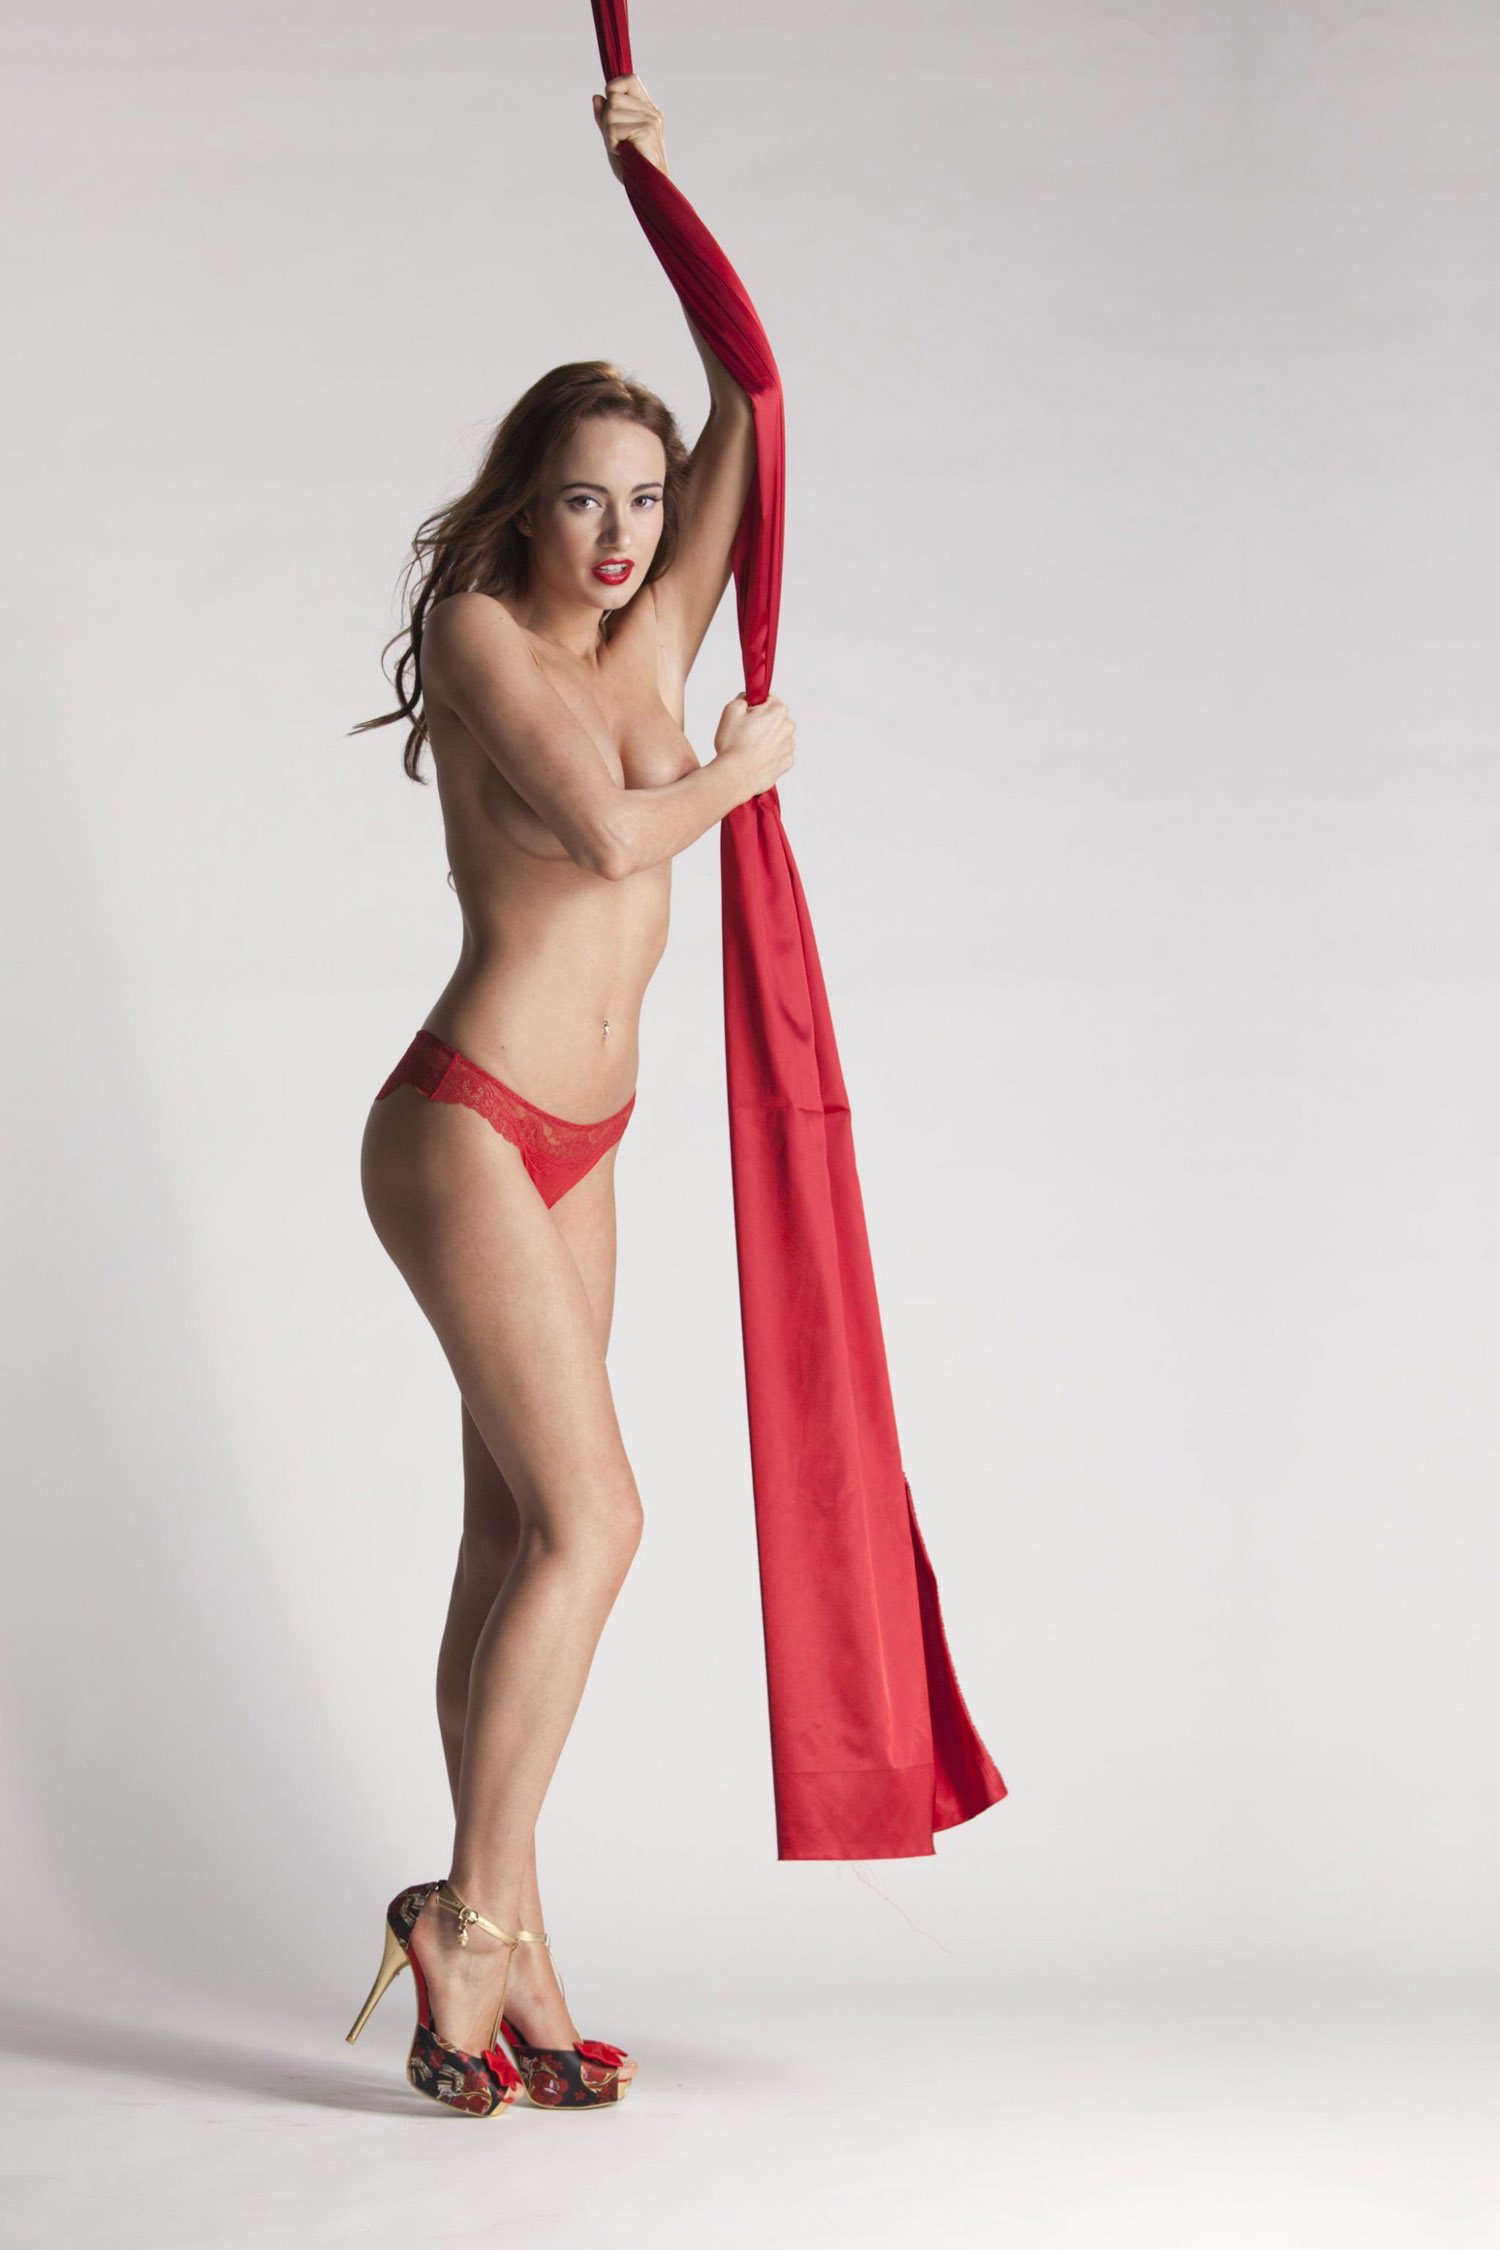 Каролина Крезлова голая. Фото - 40